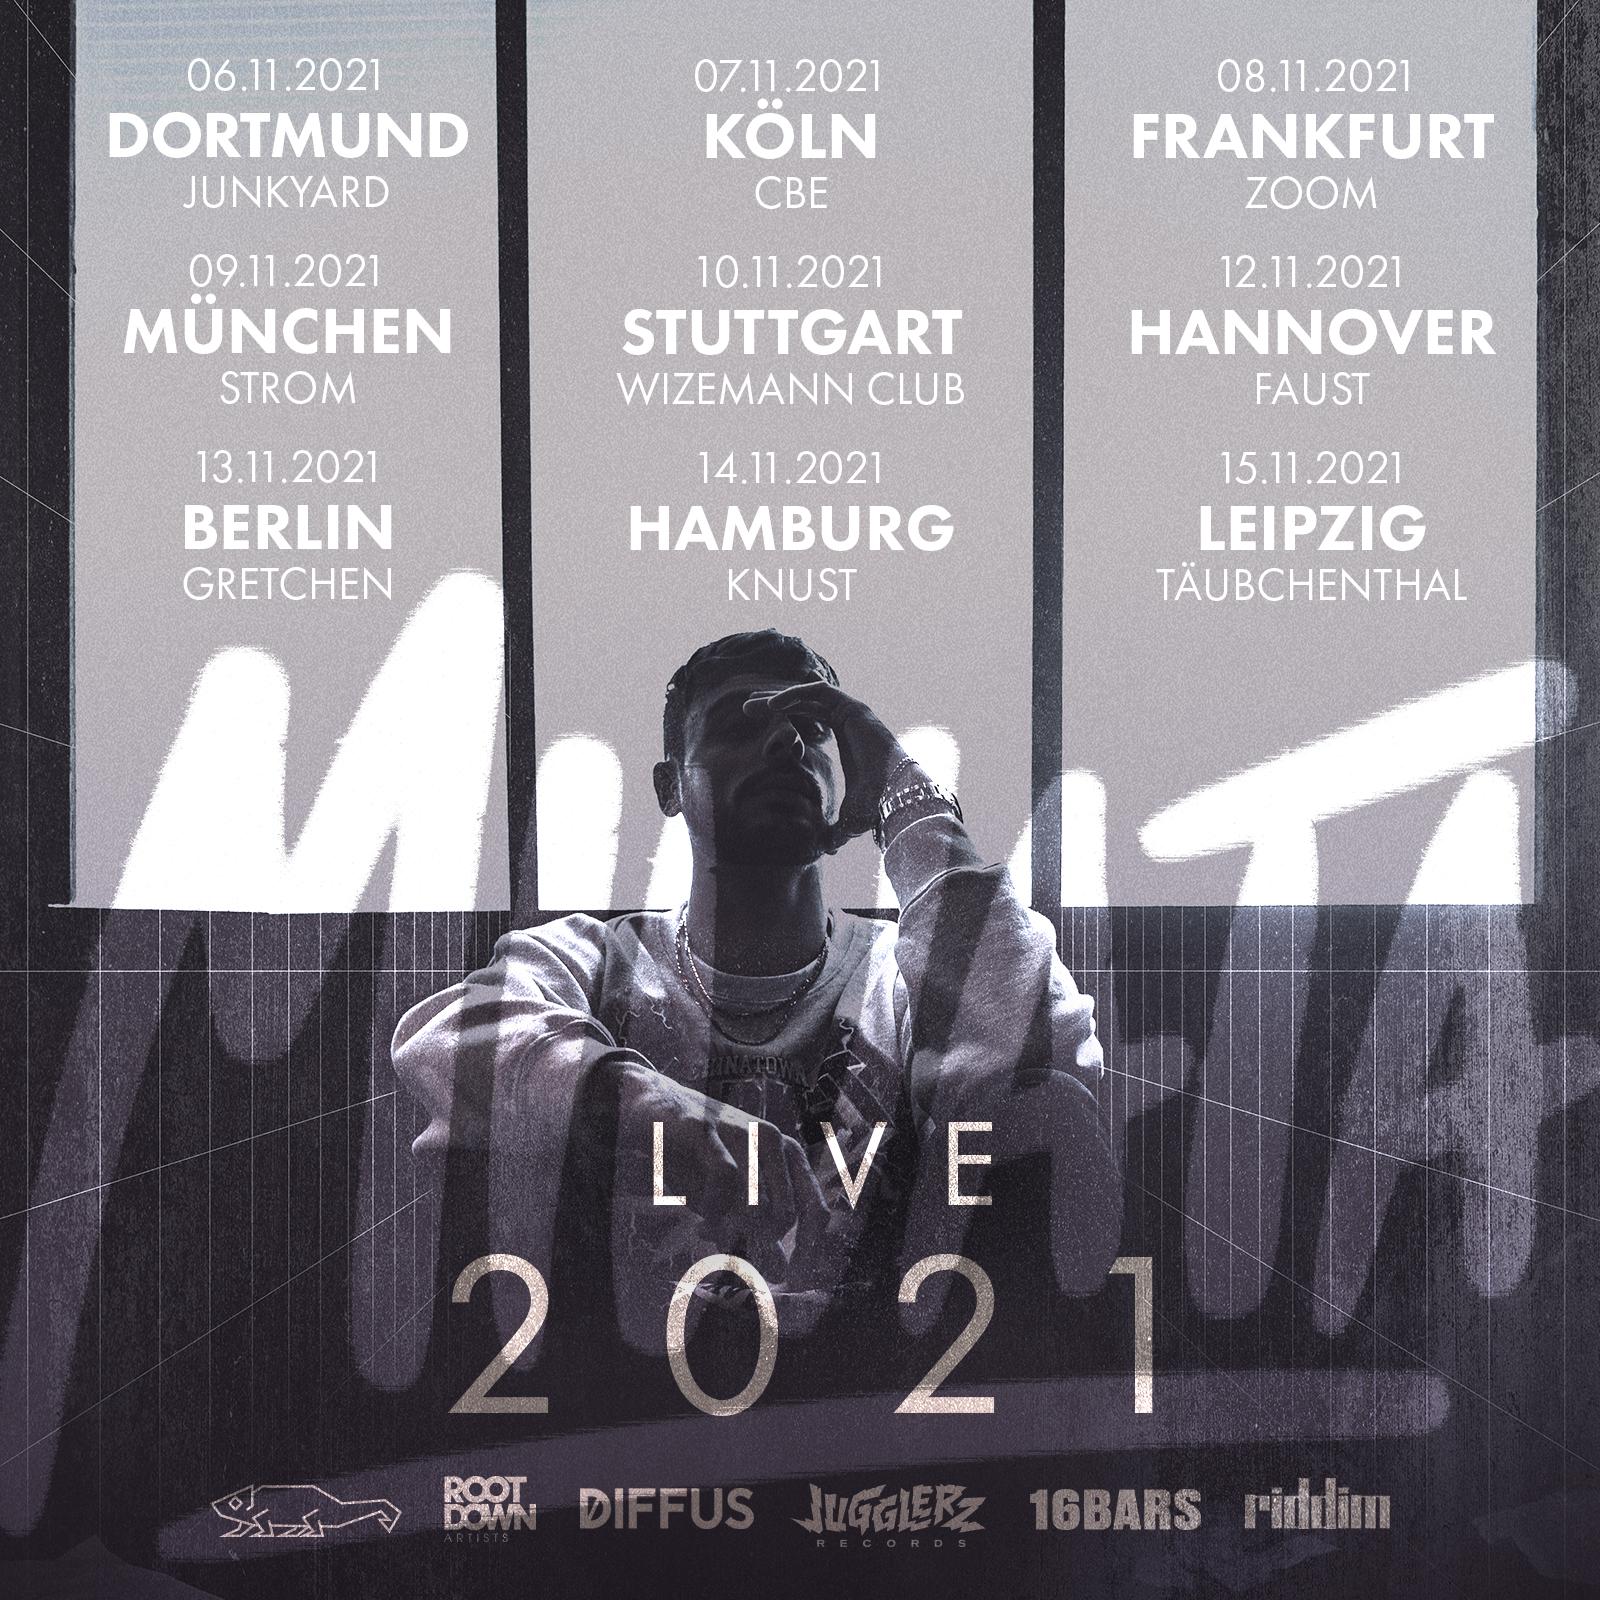 Tourplakat Miwata Live: 06.11.2021 Dortmund, 07.11.2021 Köln, 08.11.2021 Frankfurt, 09.11.2021 München, 10.11.2021 Stuttgart, 12.11.2021 Hannover, 13.11.2021 Berlin, 14.11.2021 Hamburg, 15.11.2021 Leipzig